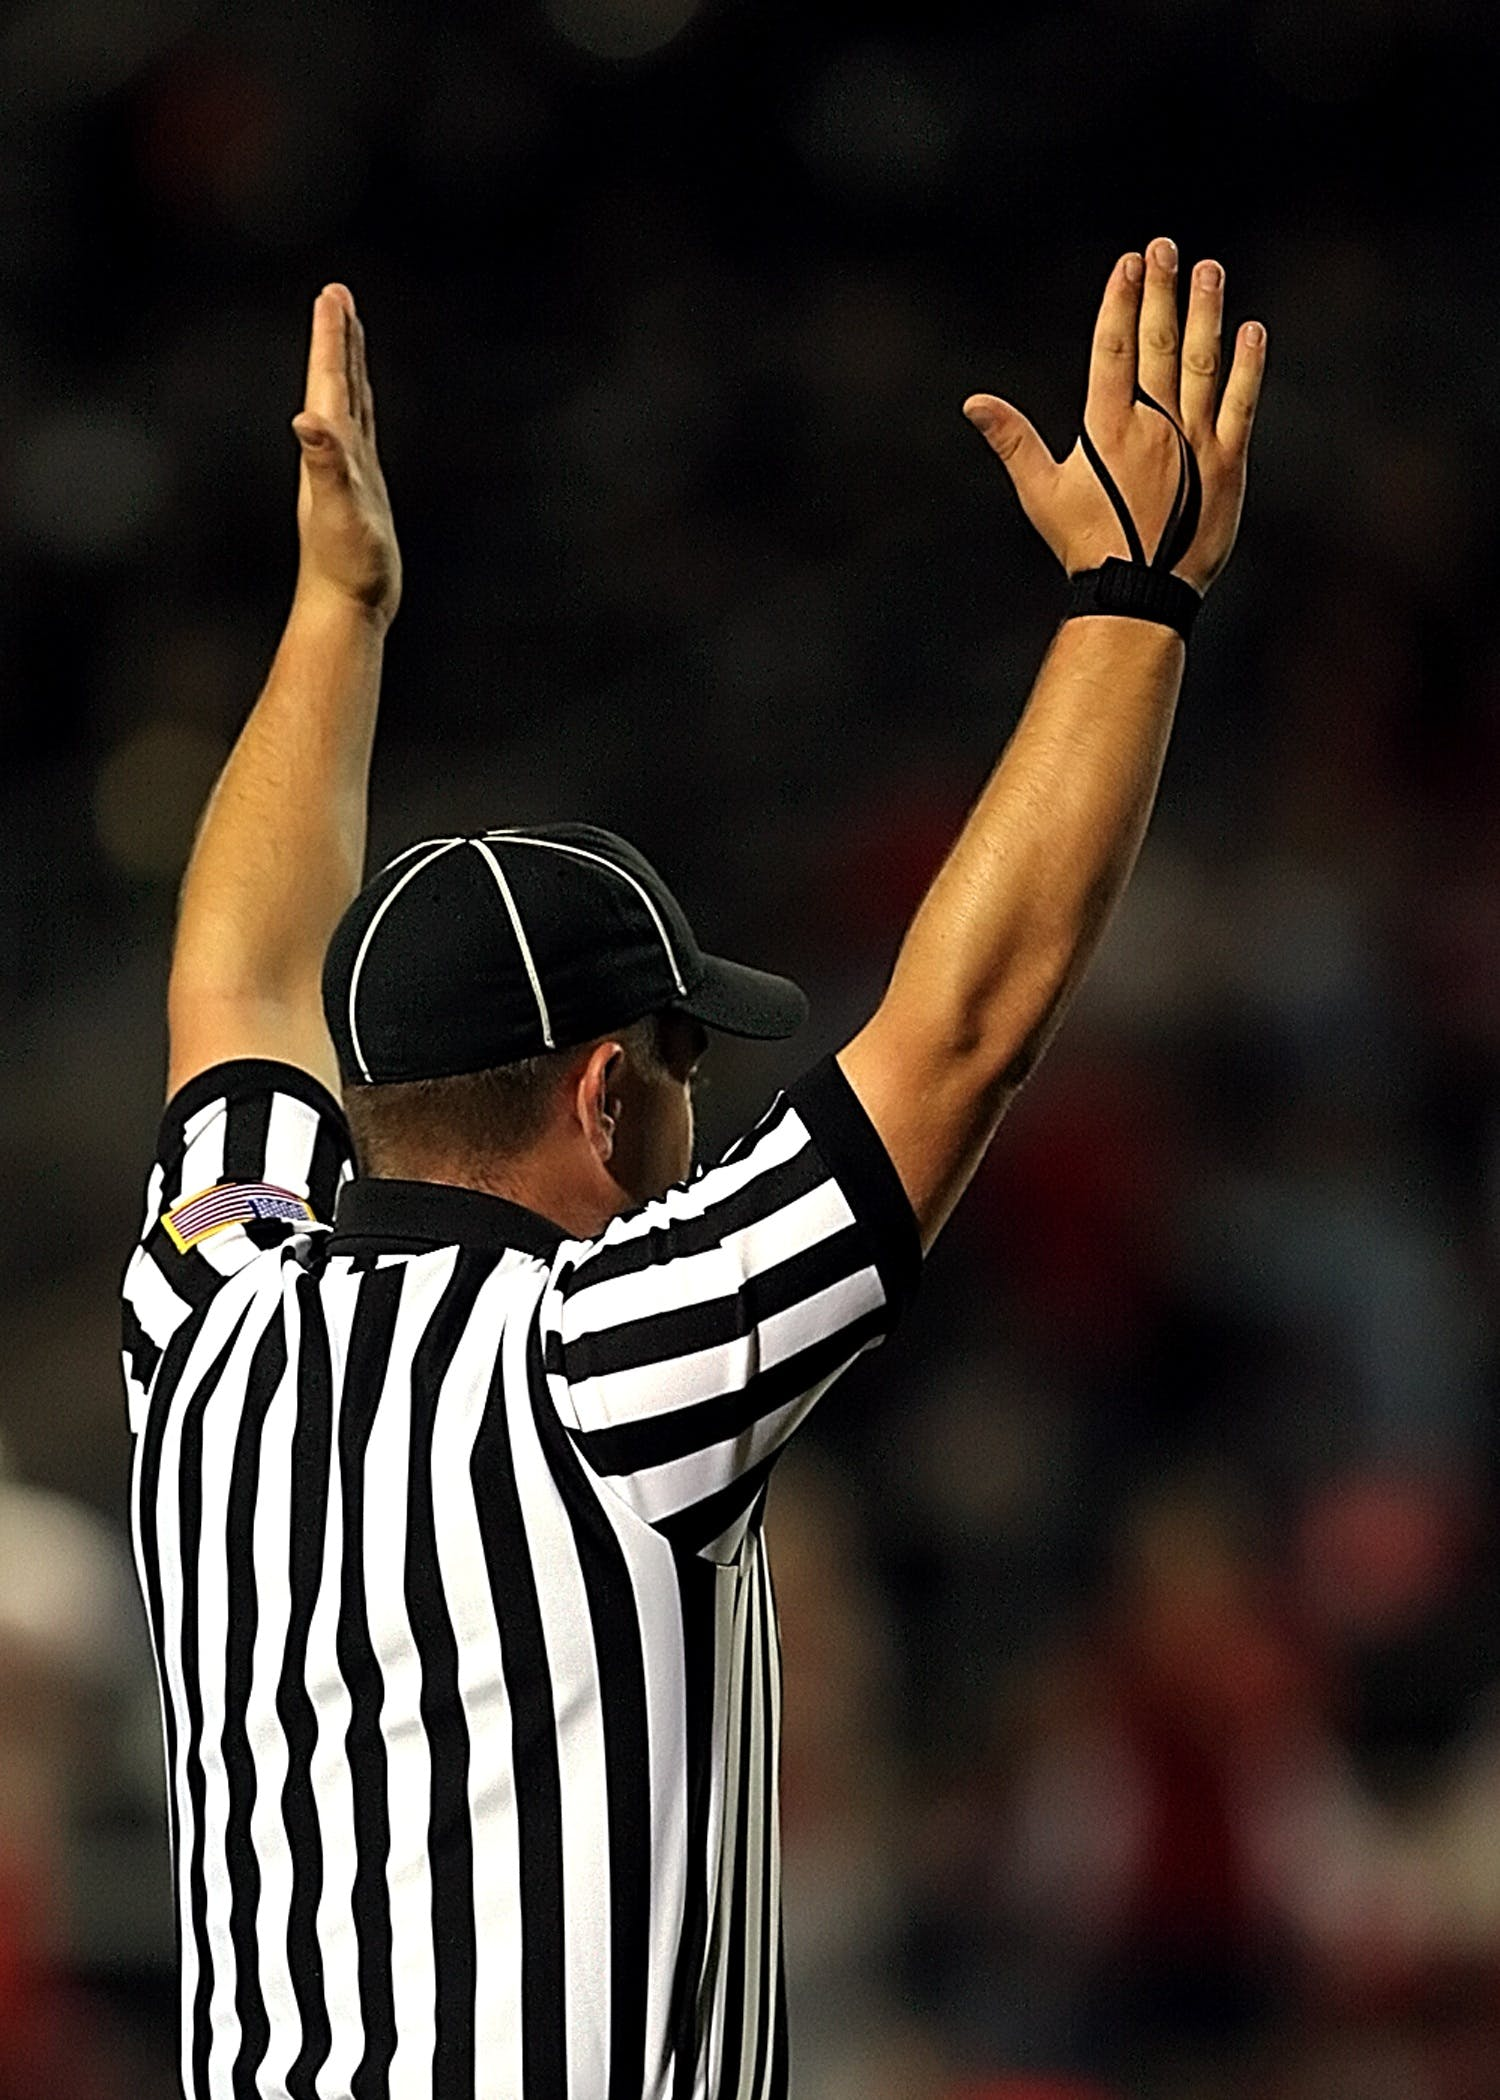 Referee Raising Both Hands